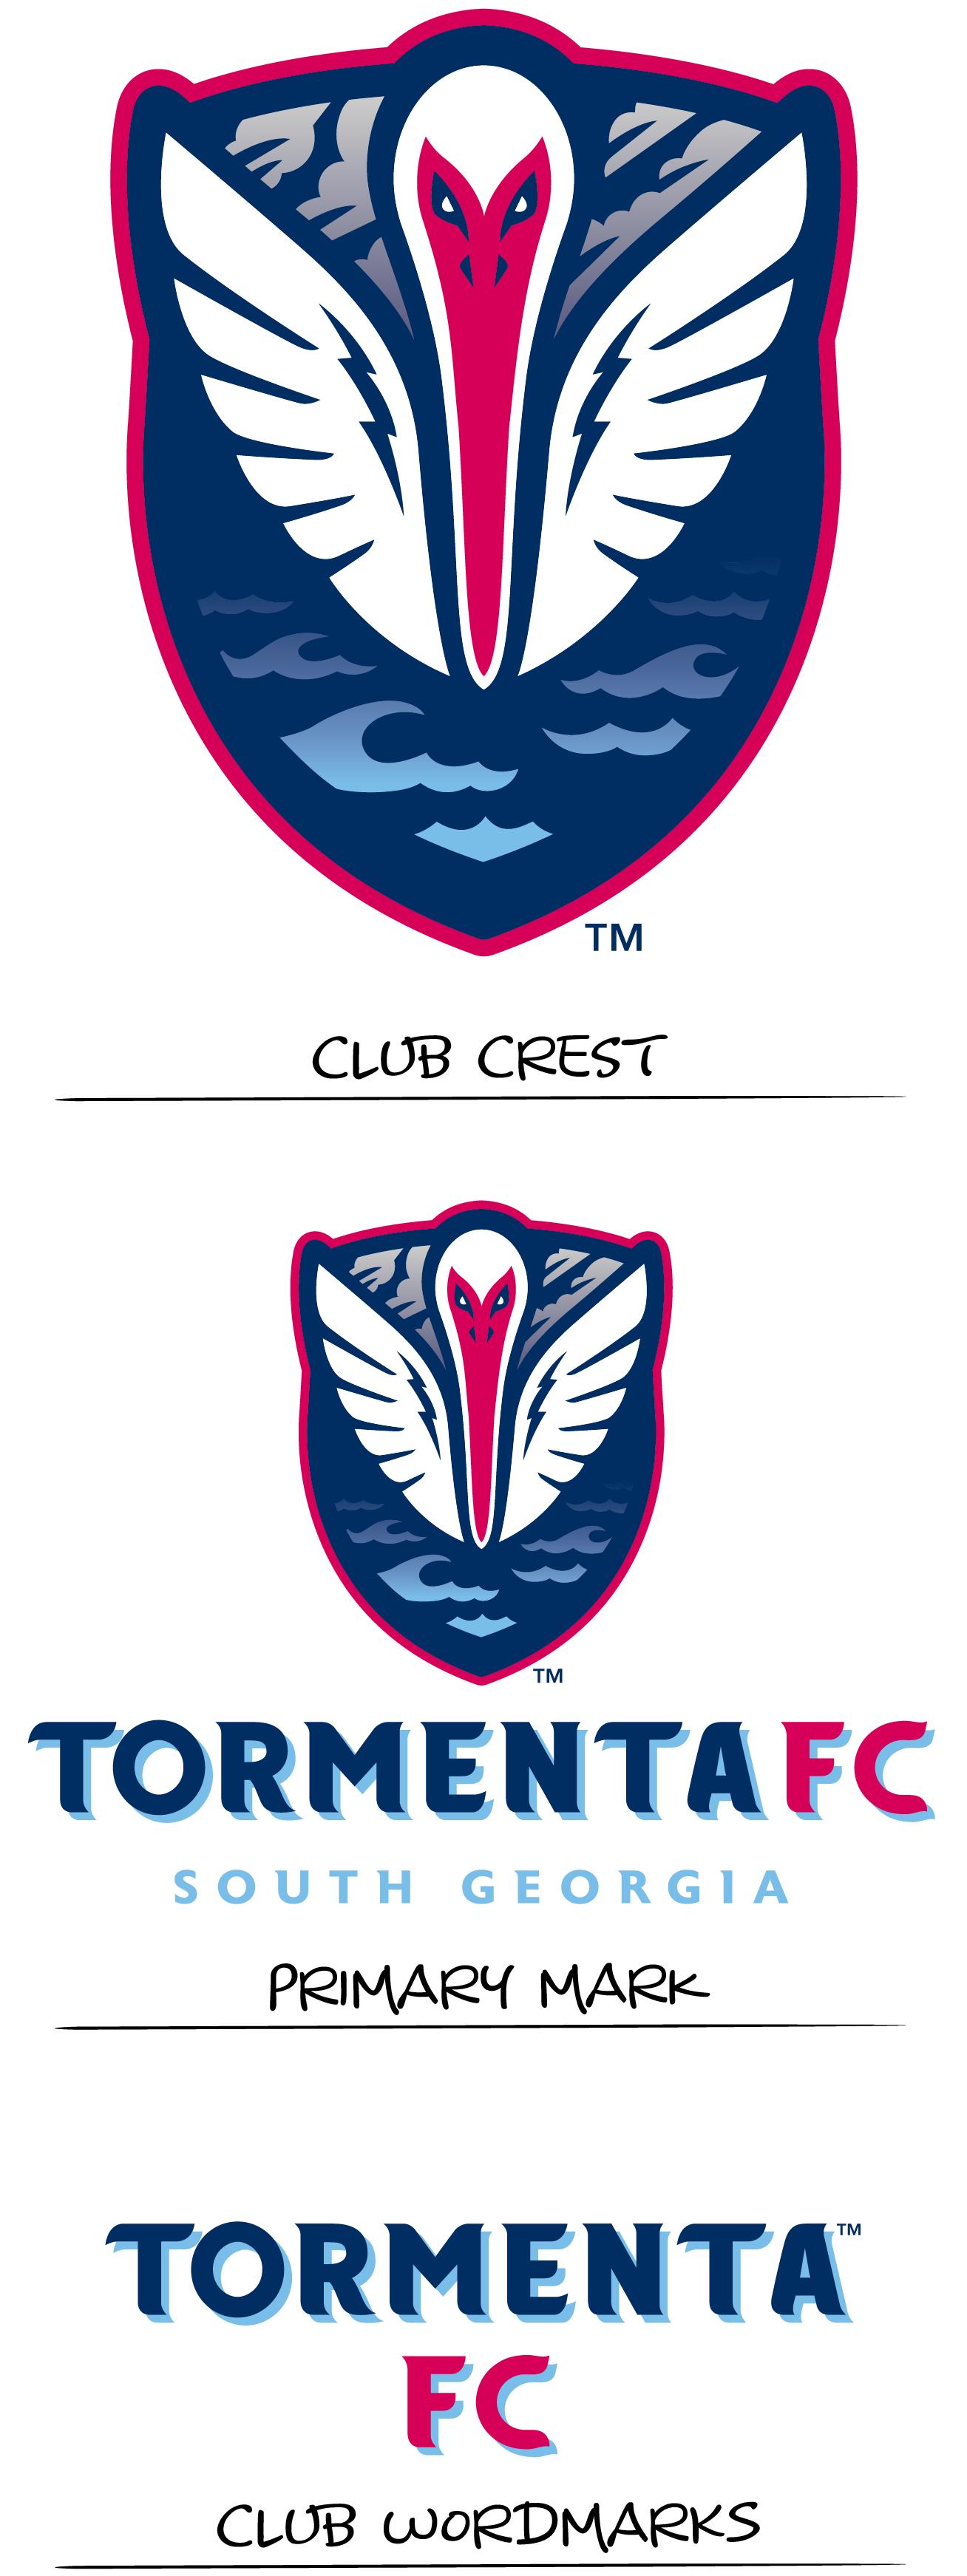 TormentaFC-2-Identity_Identity-1.png